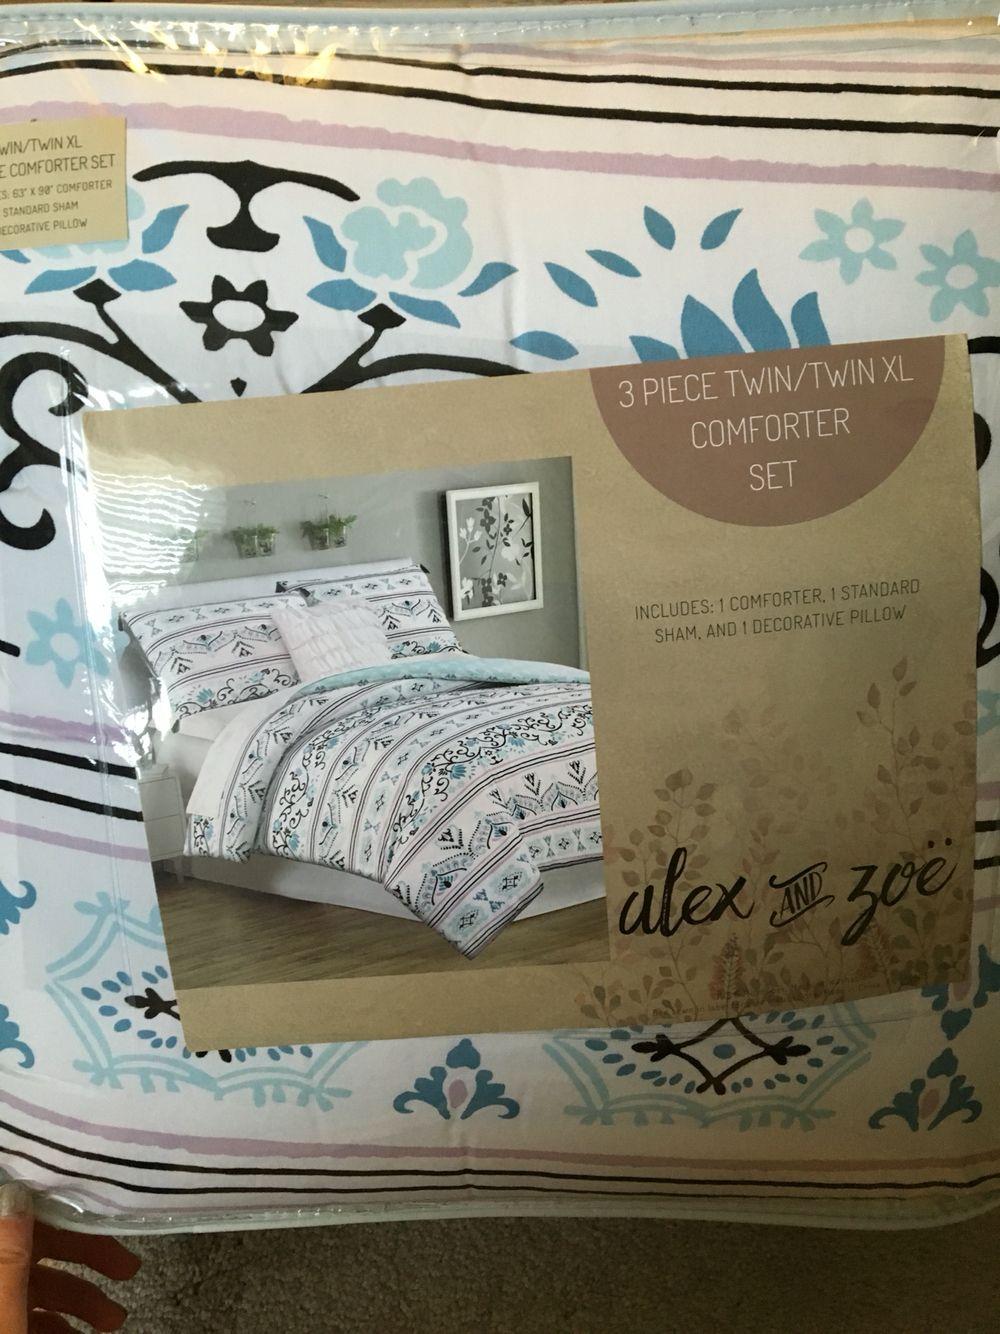 alex and zoe 3 piece comforter set.   stuff i got for my dorm